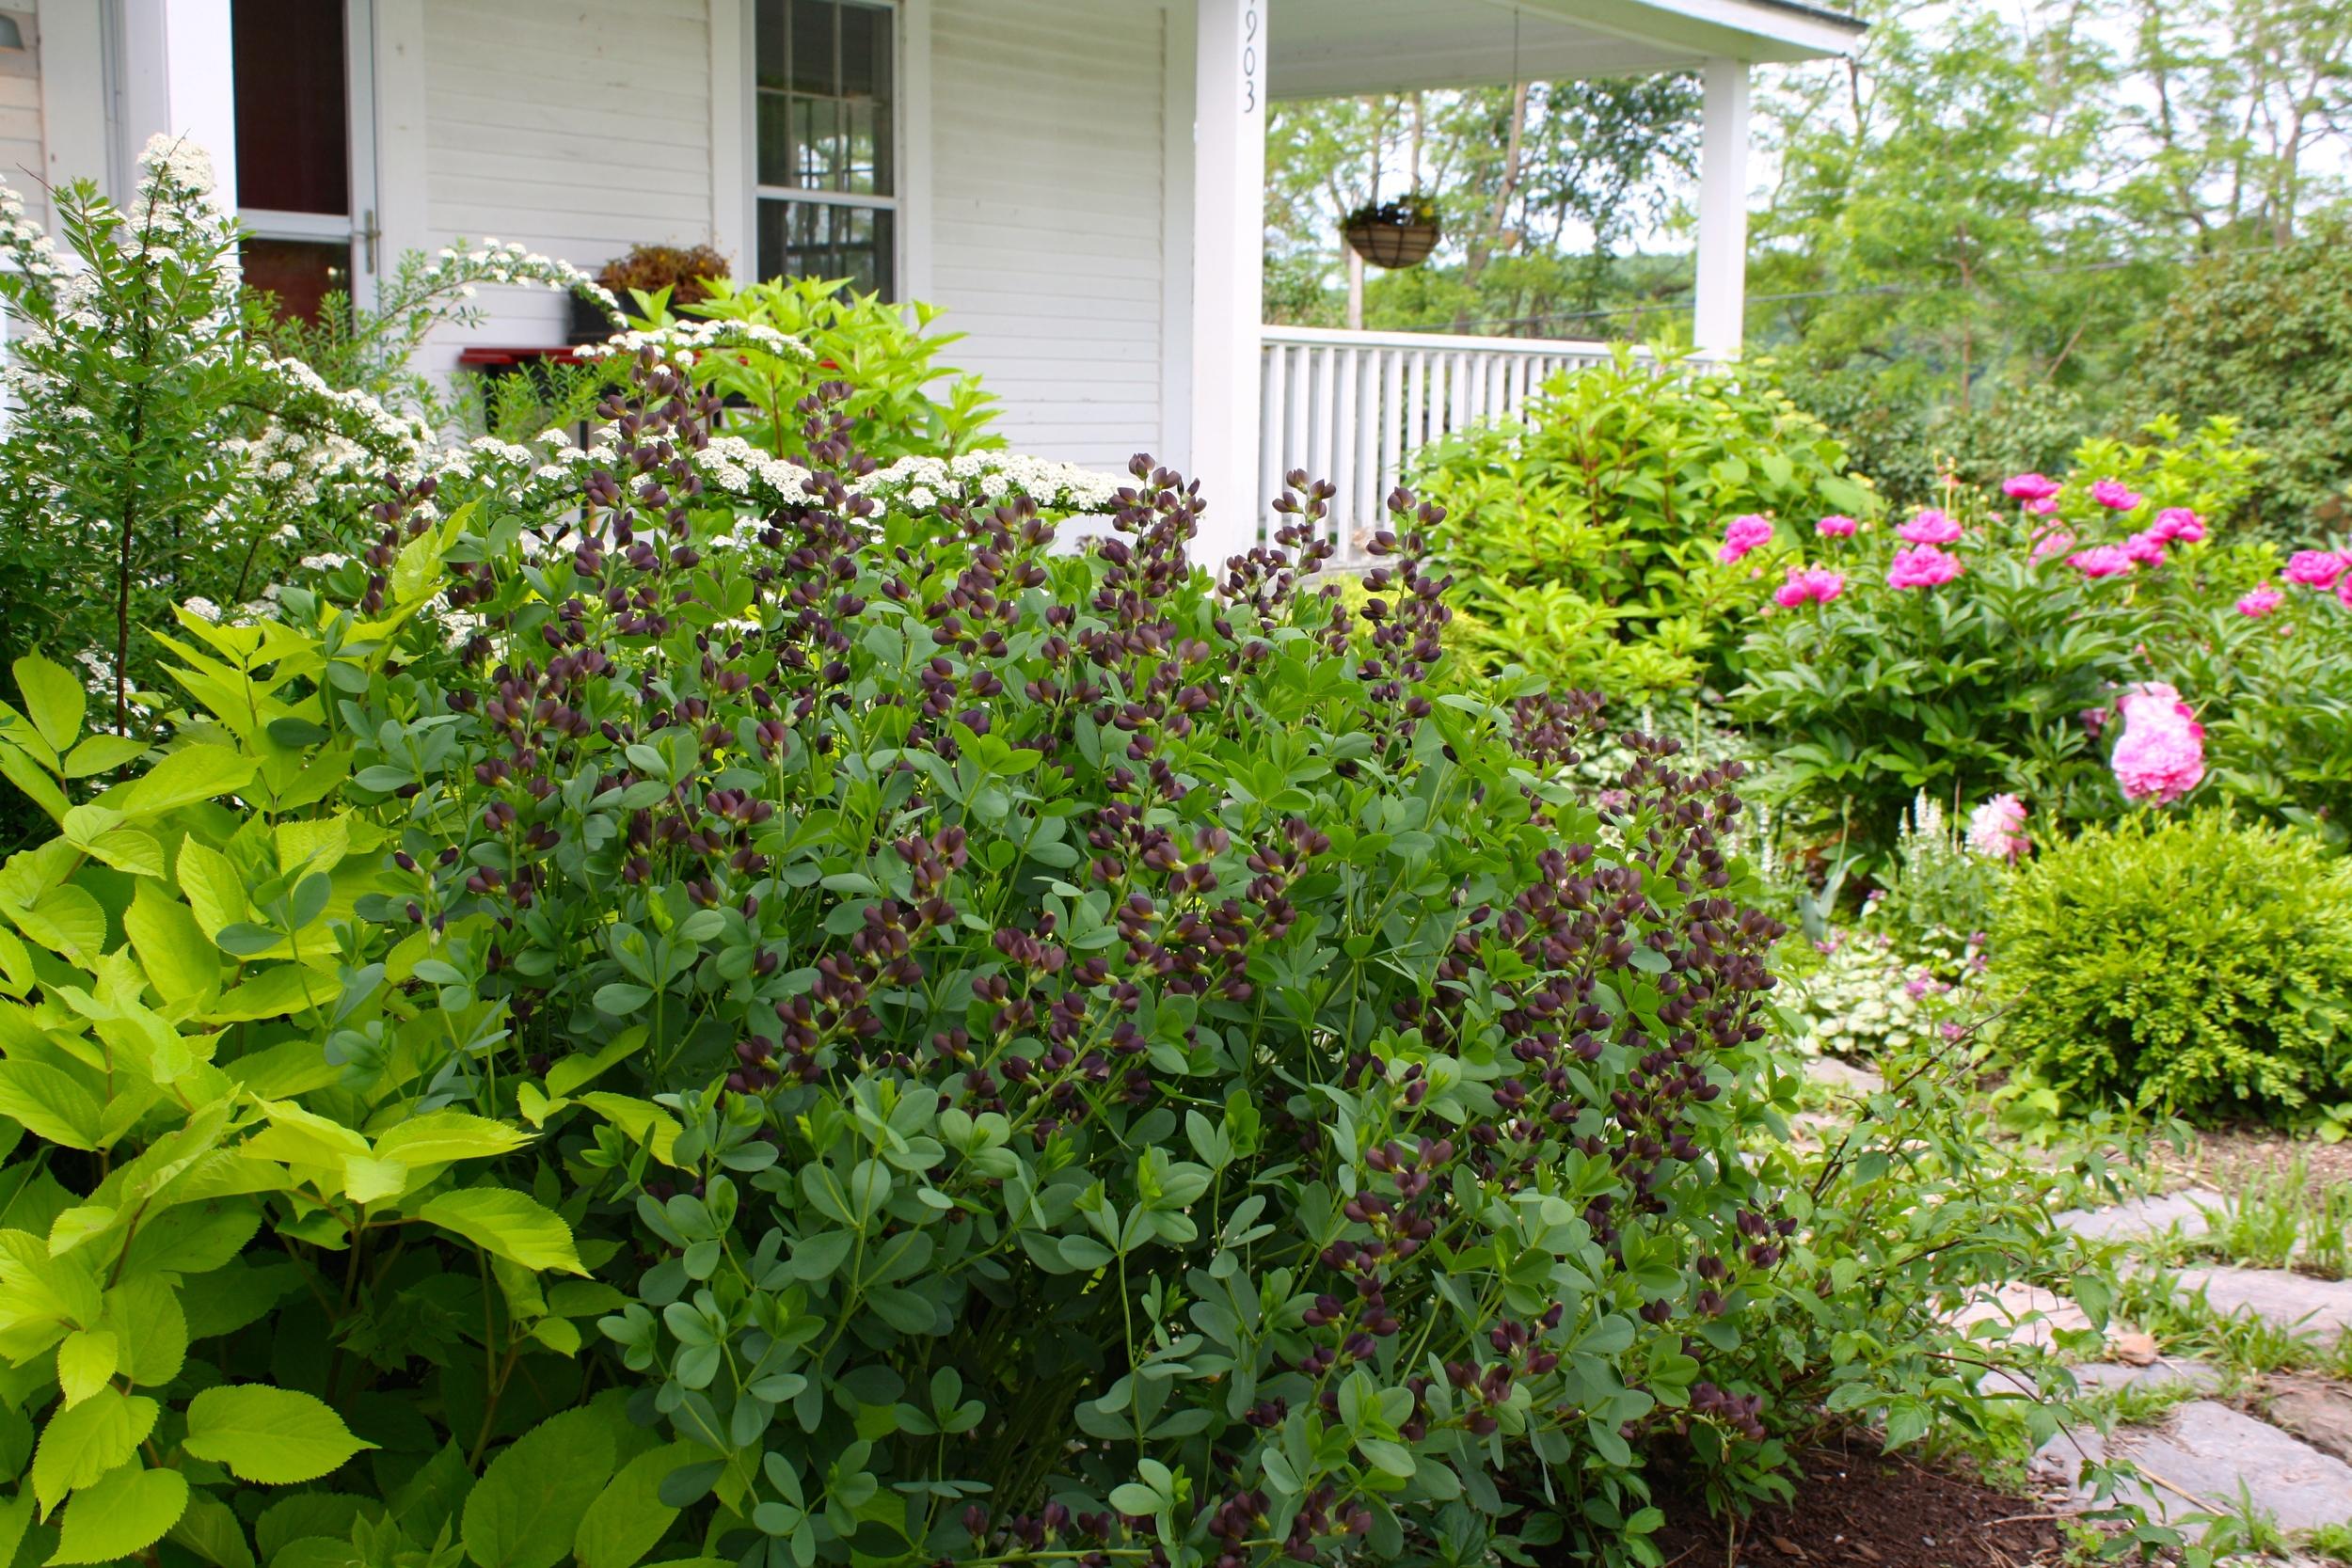 Baptisia 'Chocolate Decadence' blooming